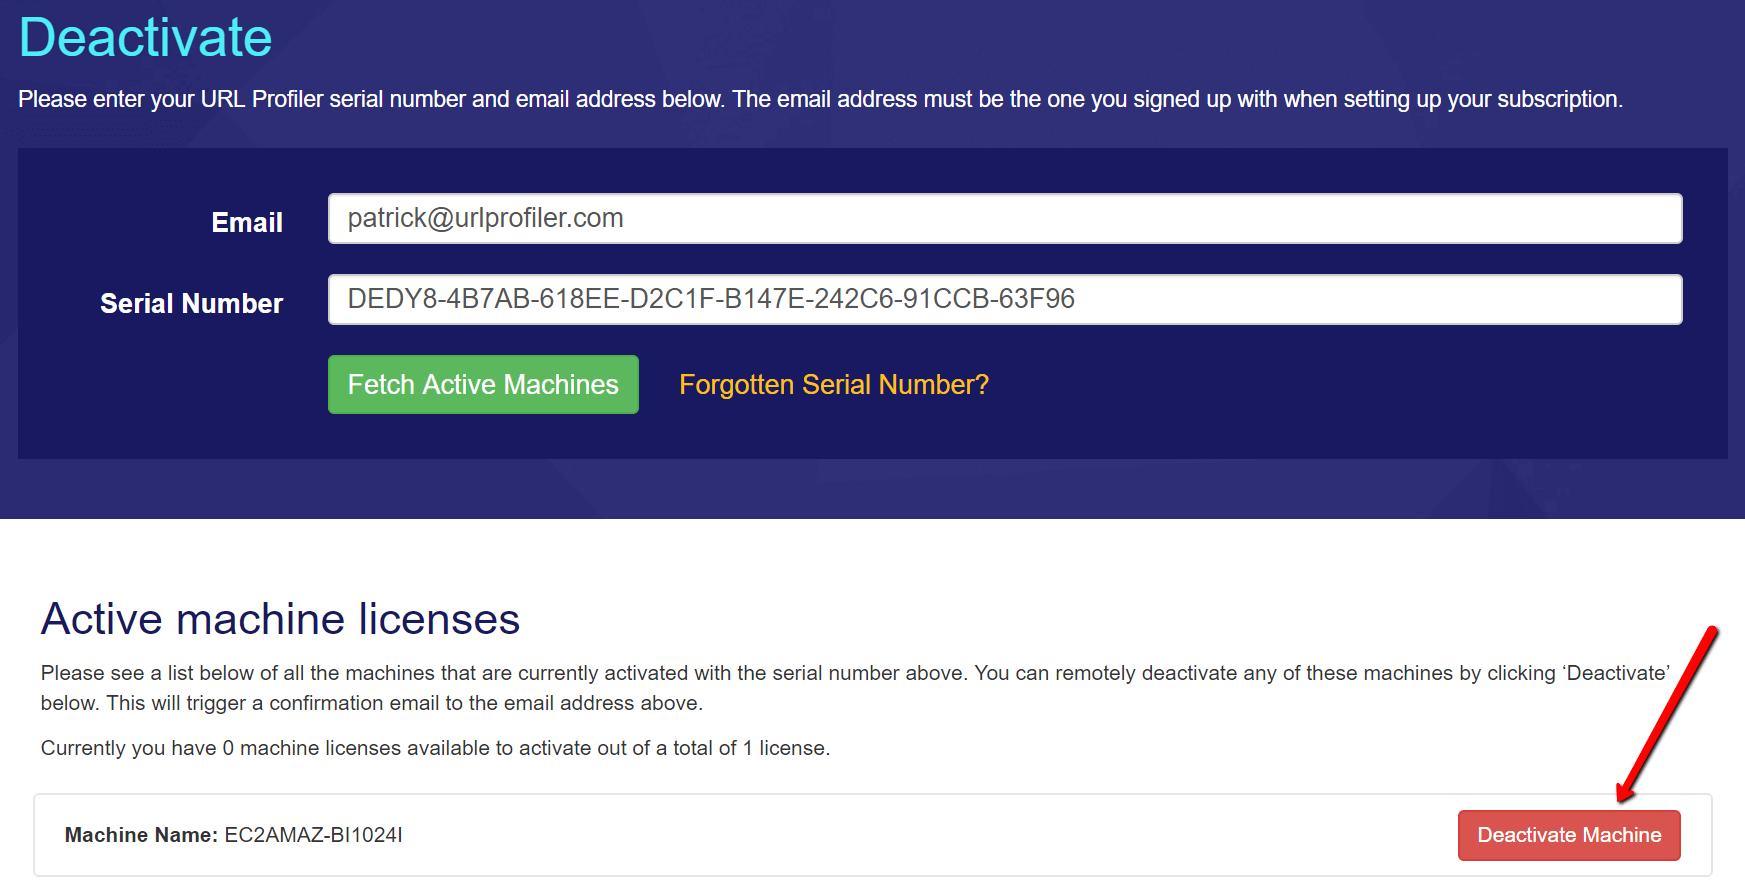 Deactivate URL Profiler license